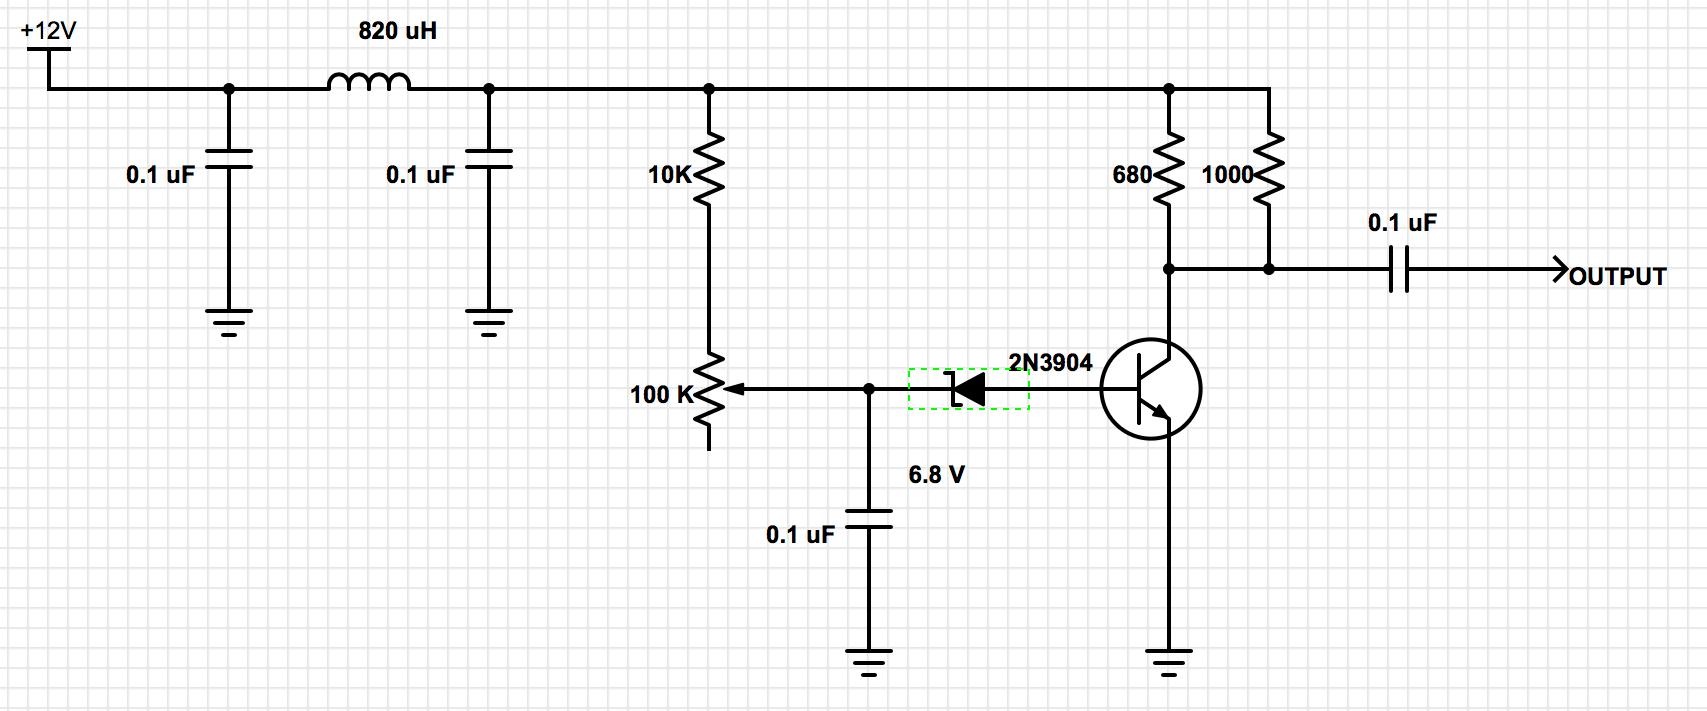 6 volt generator schematic